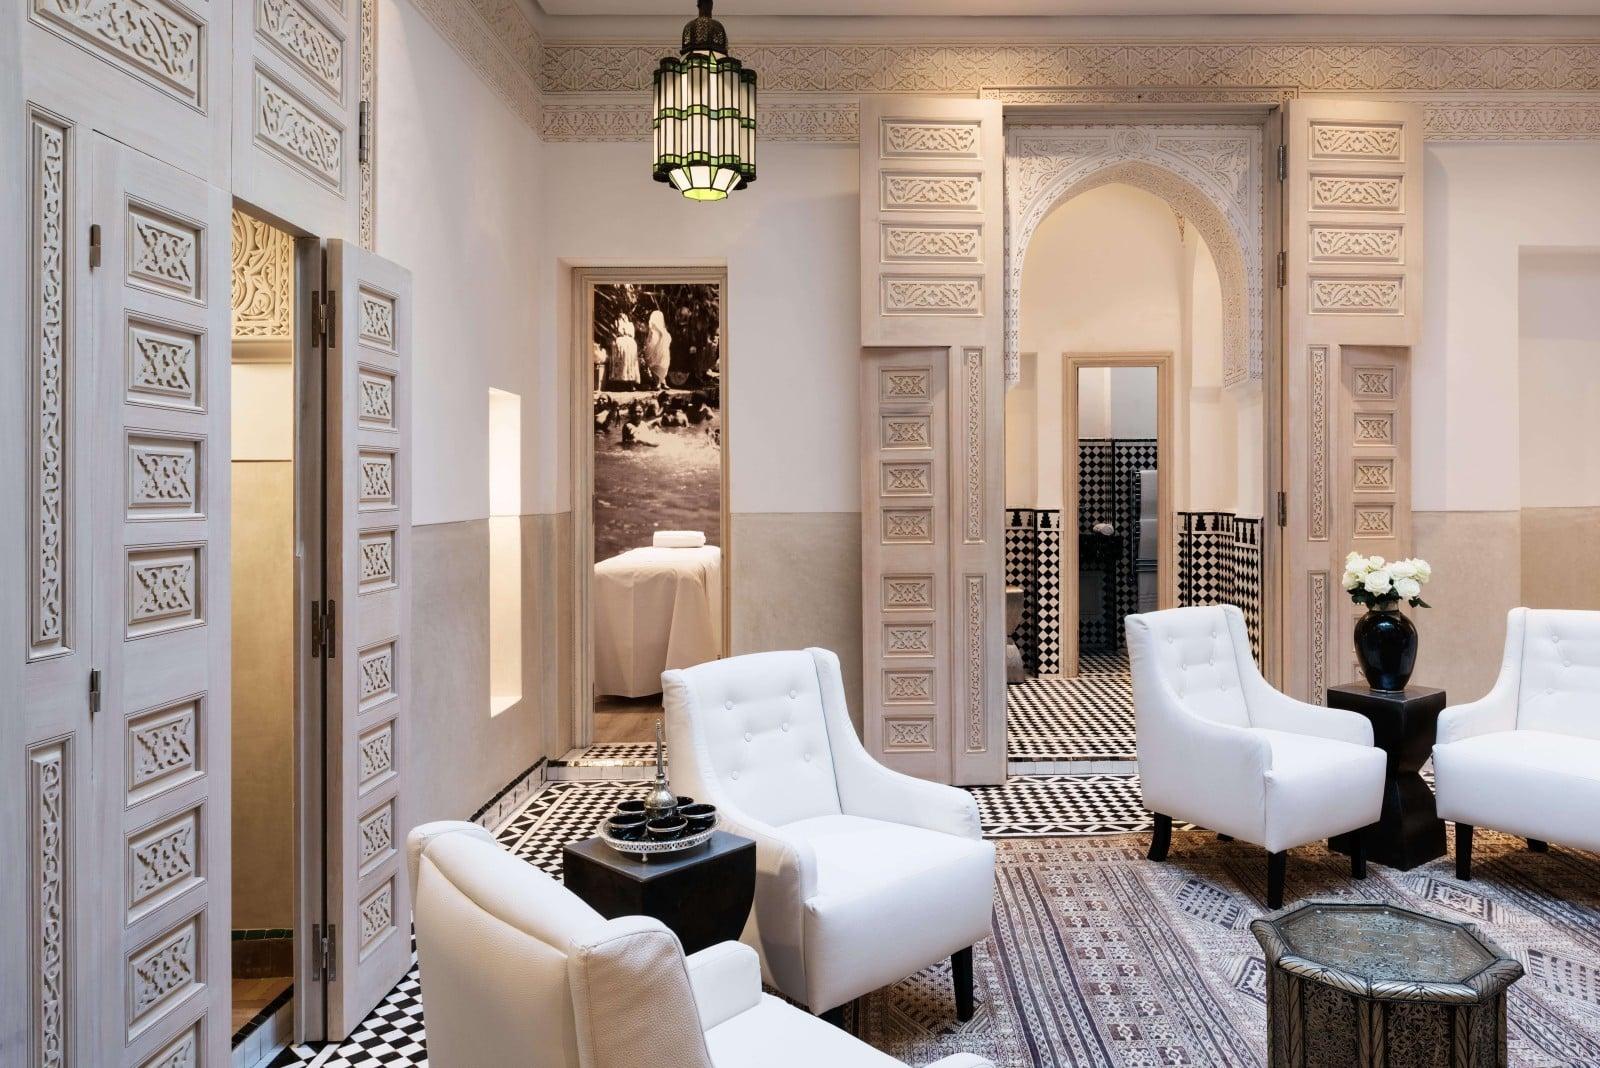 farnatchi spa, marrakech, hammam